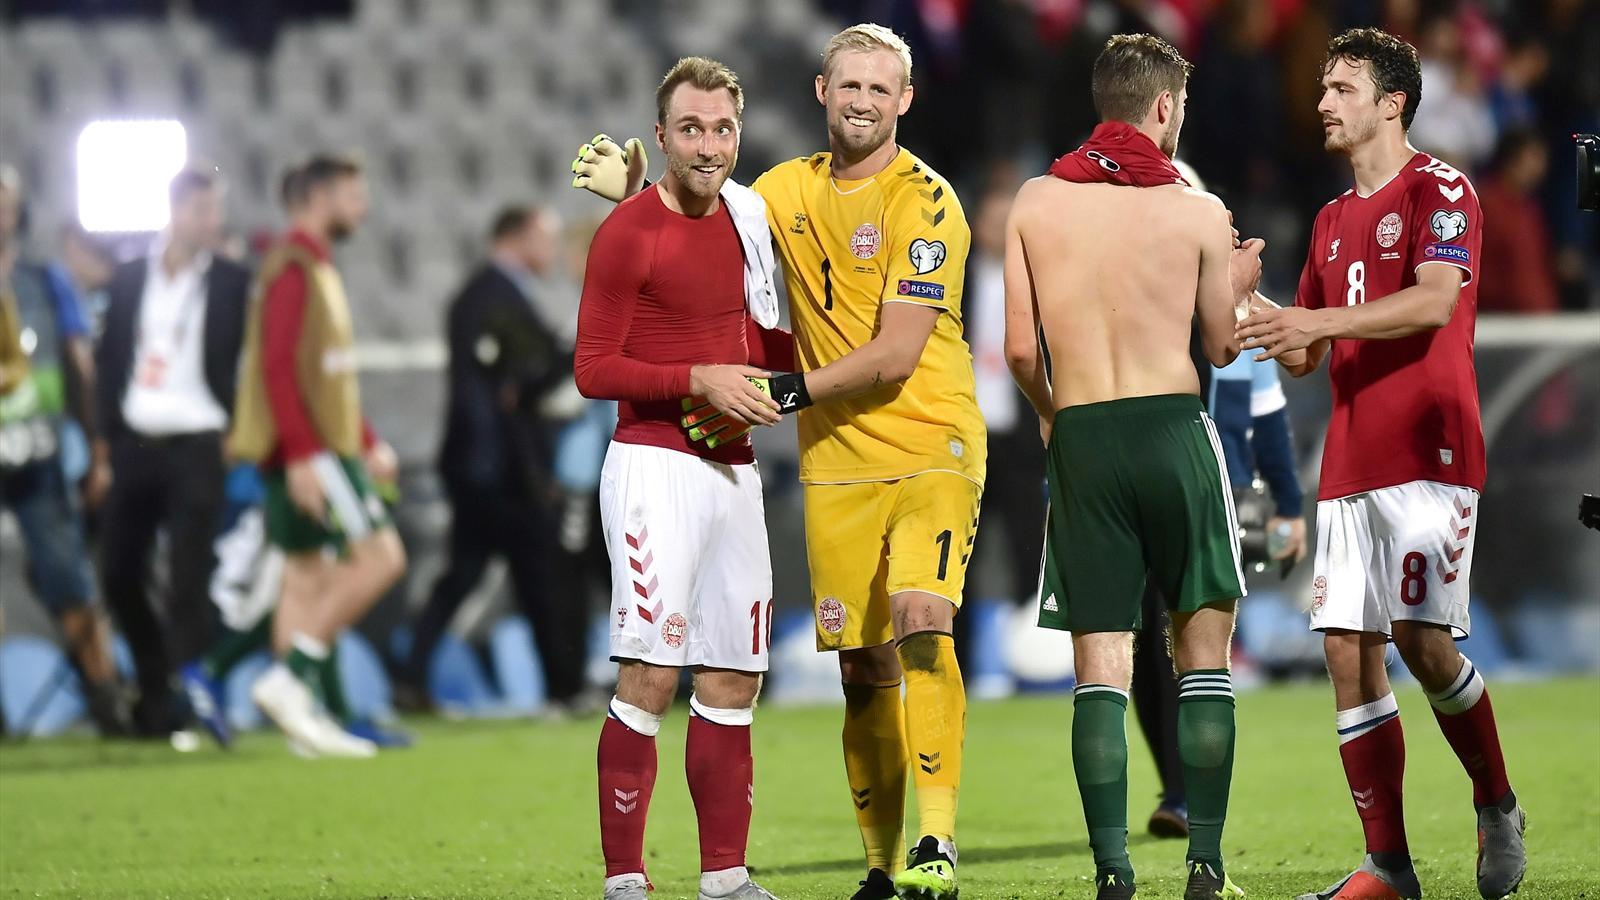 Christian Eriksen double sees Denmark sink Wales - UEFA Nations League 2018-2019 - Football ...